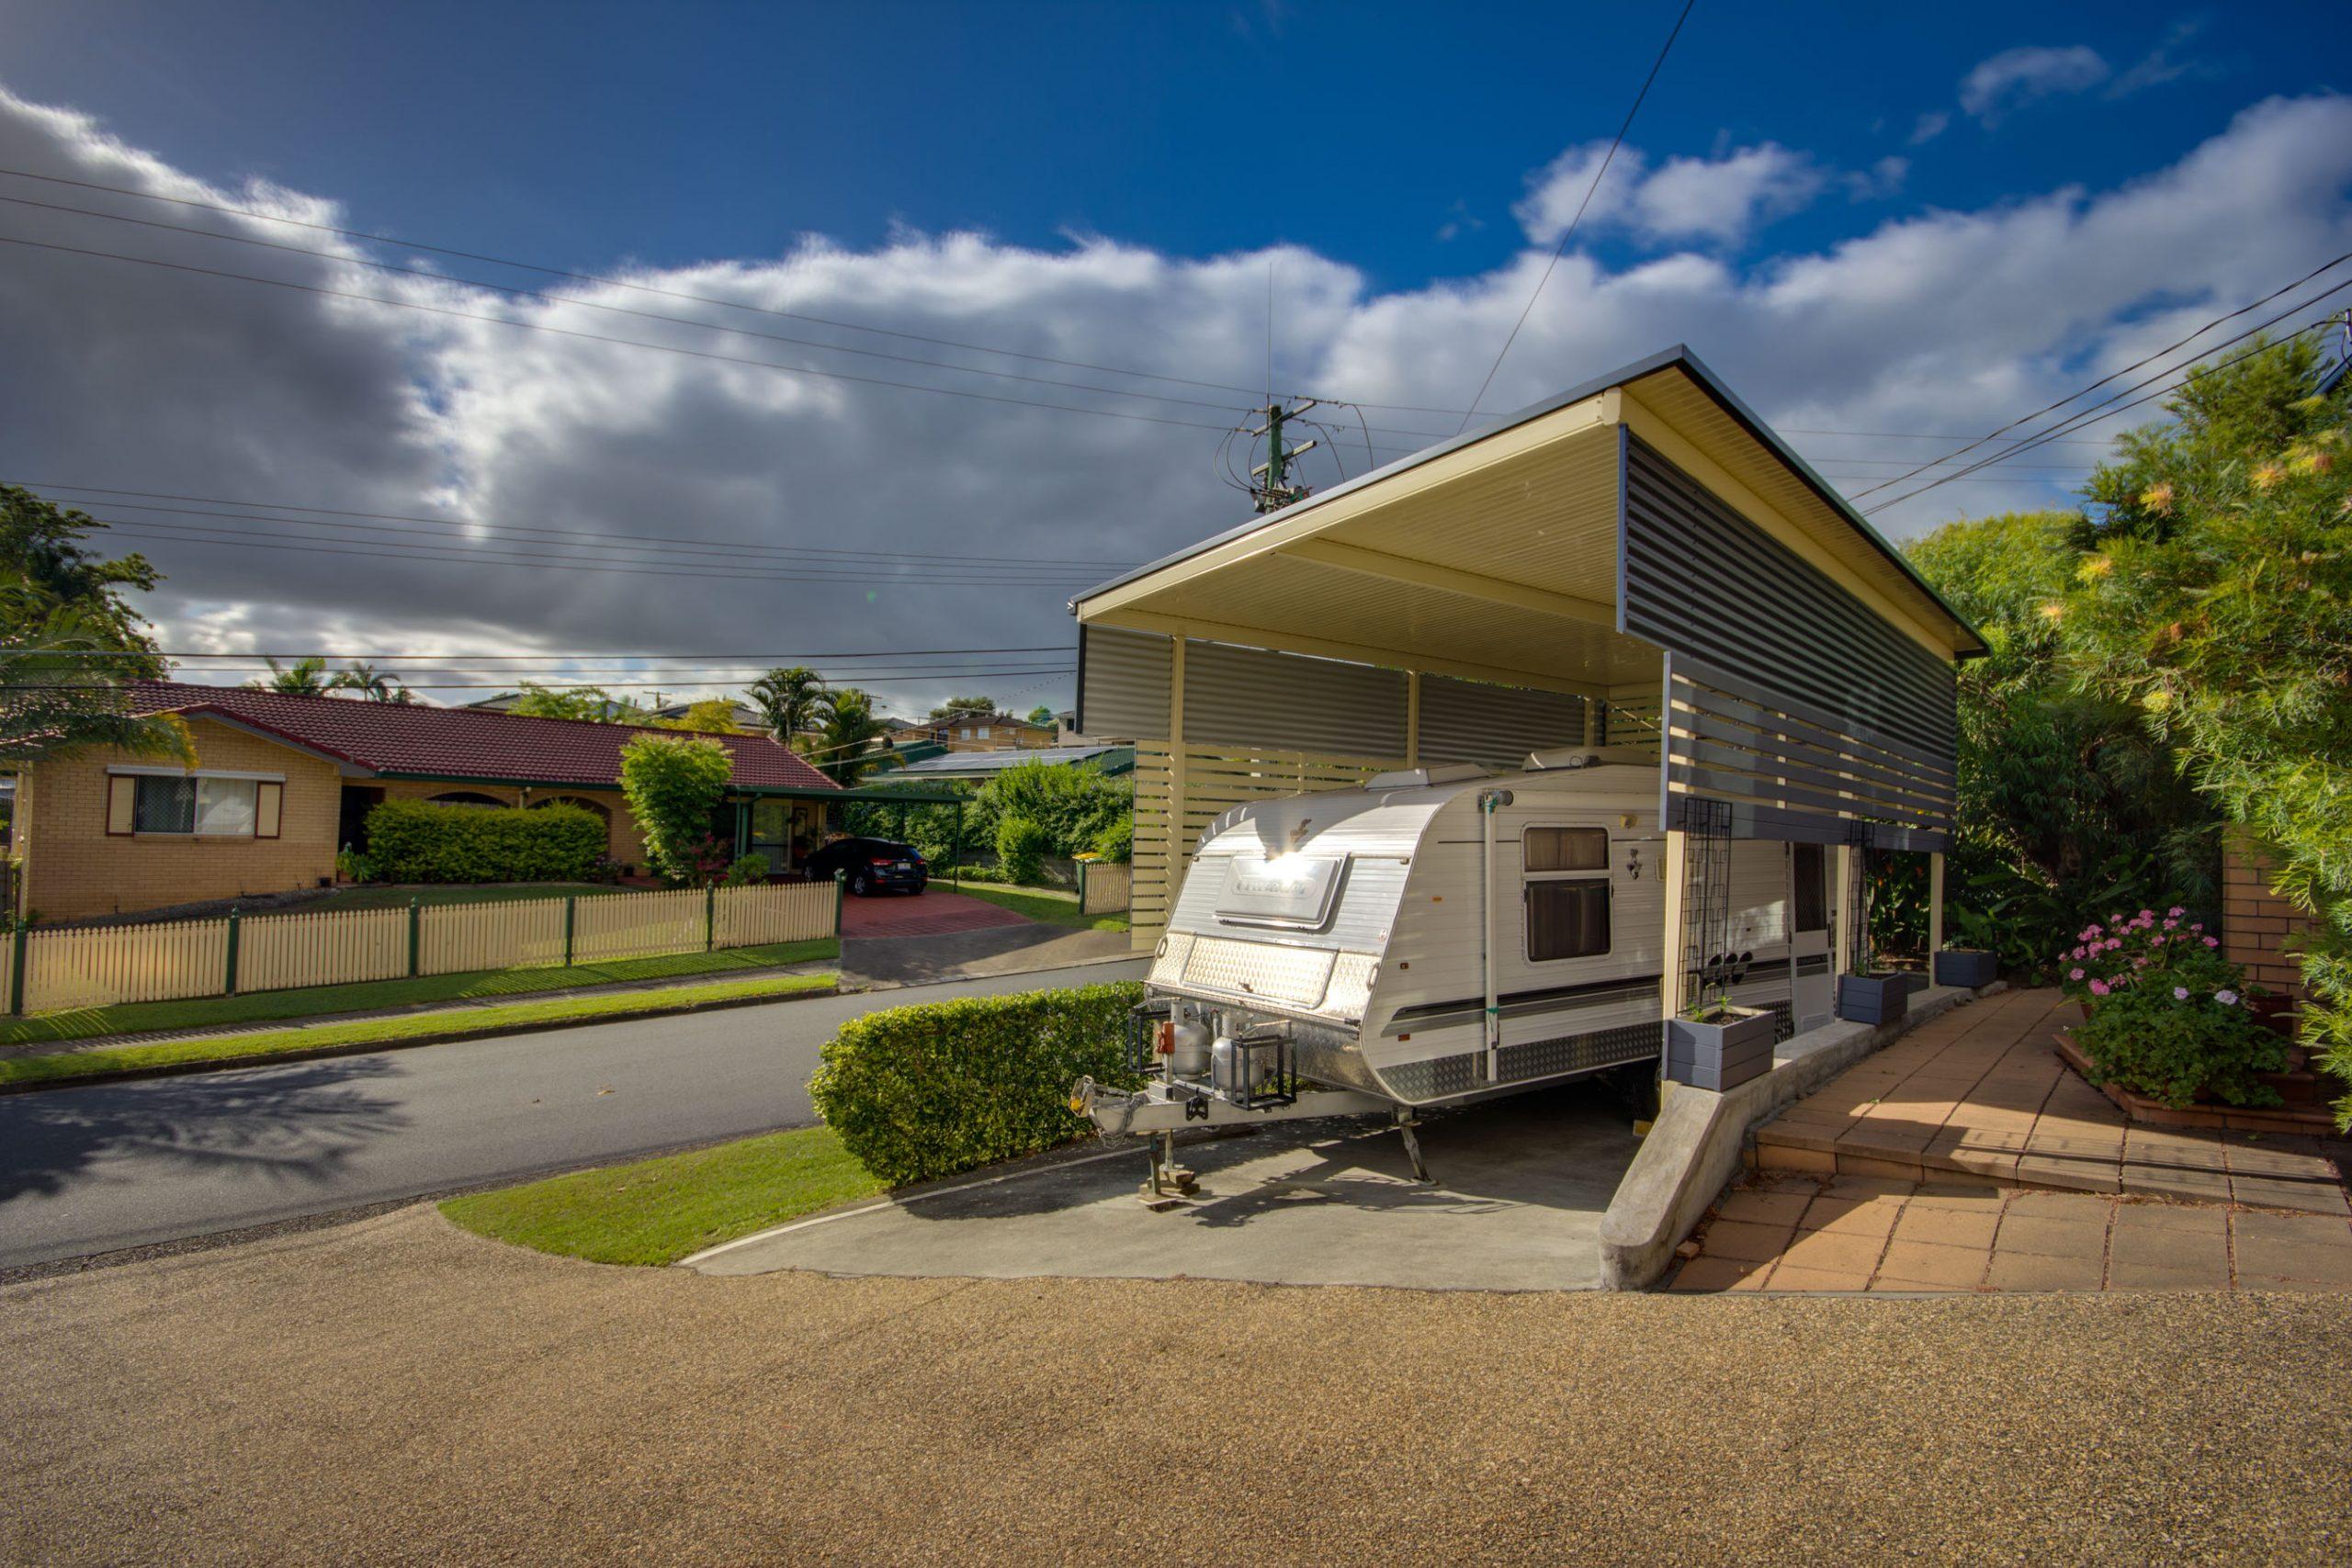 Small Carport Design Ideas Brisbane, Gold Coast & Sunshine Coast